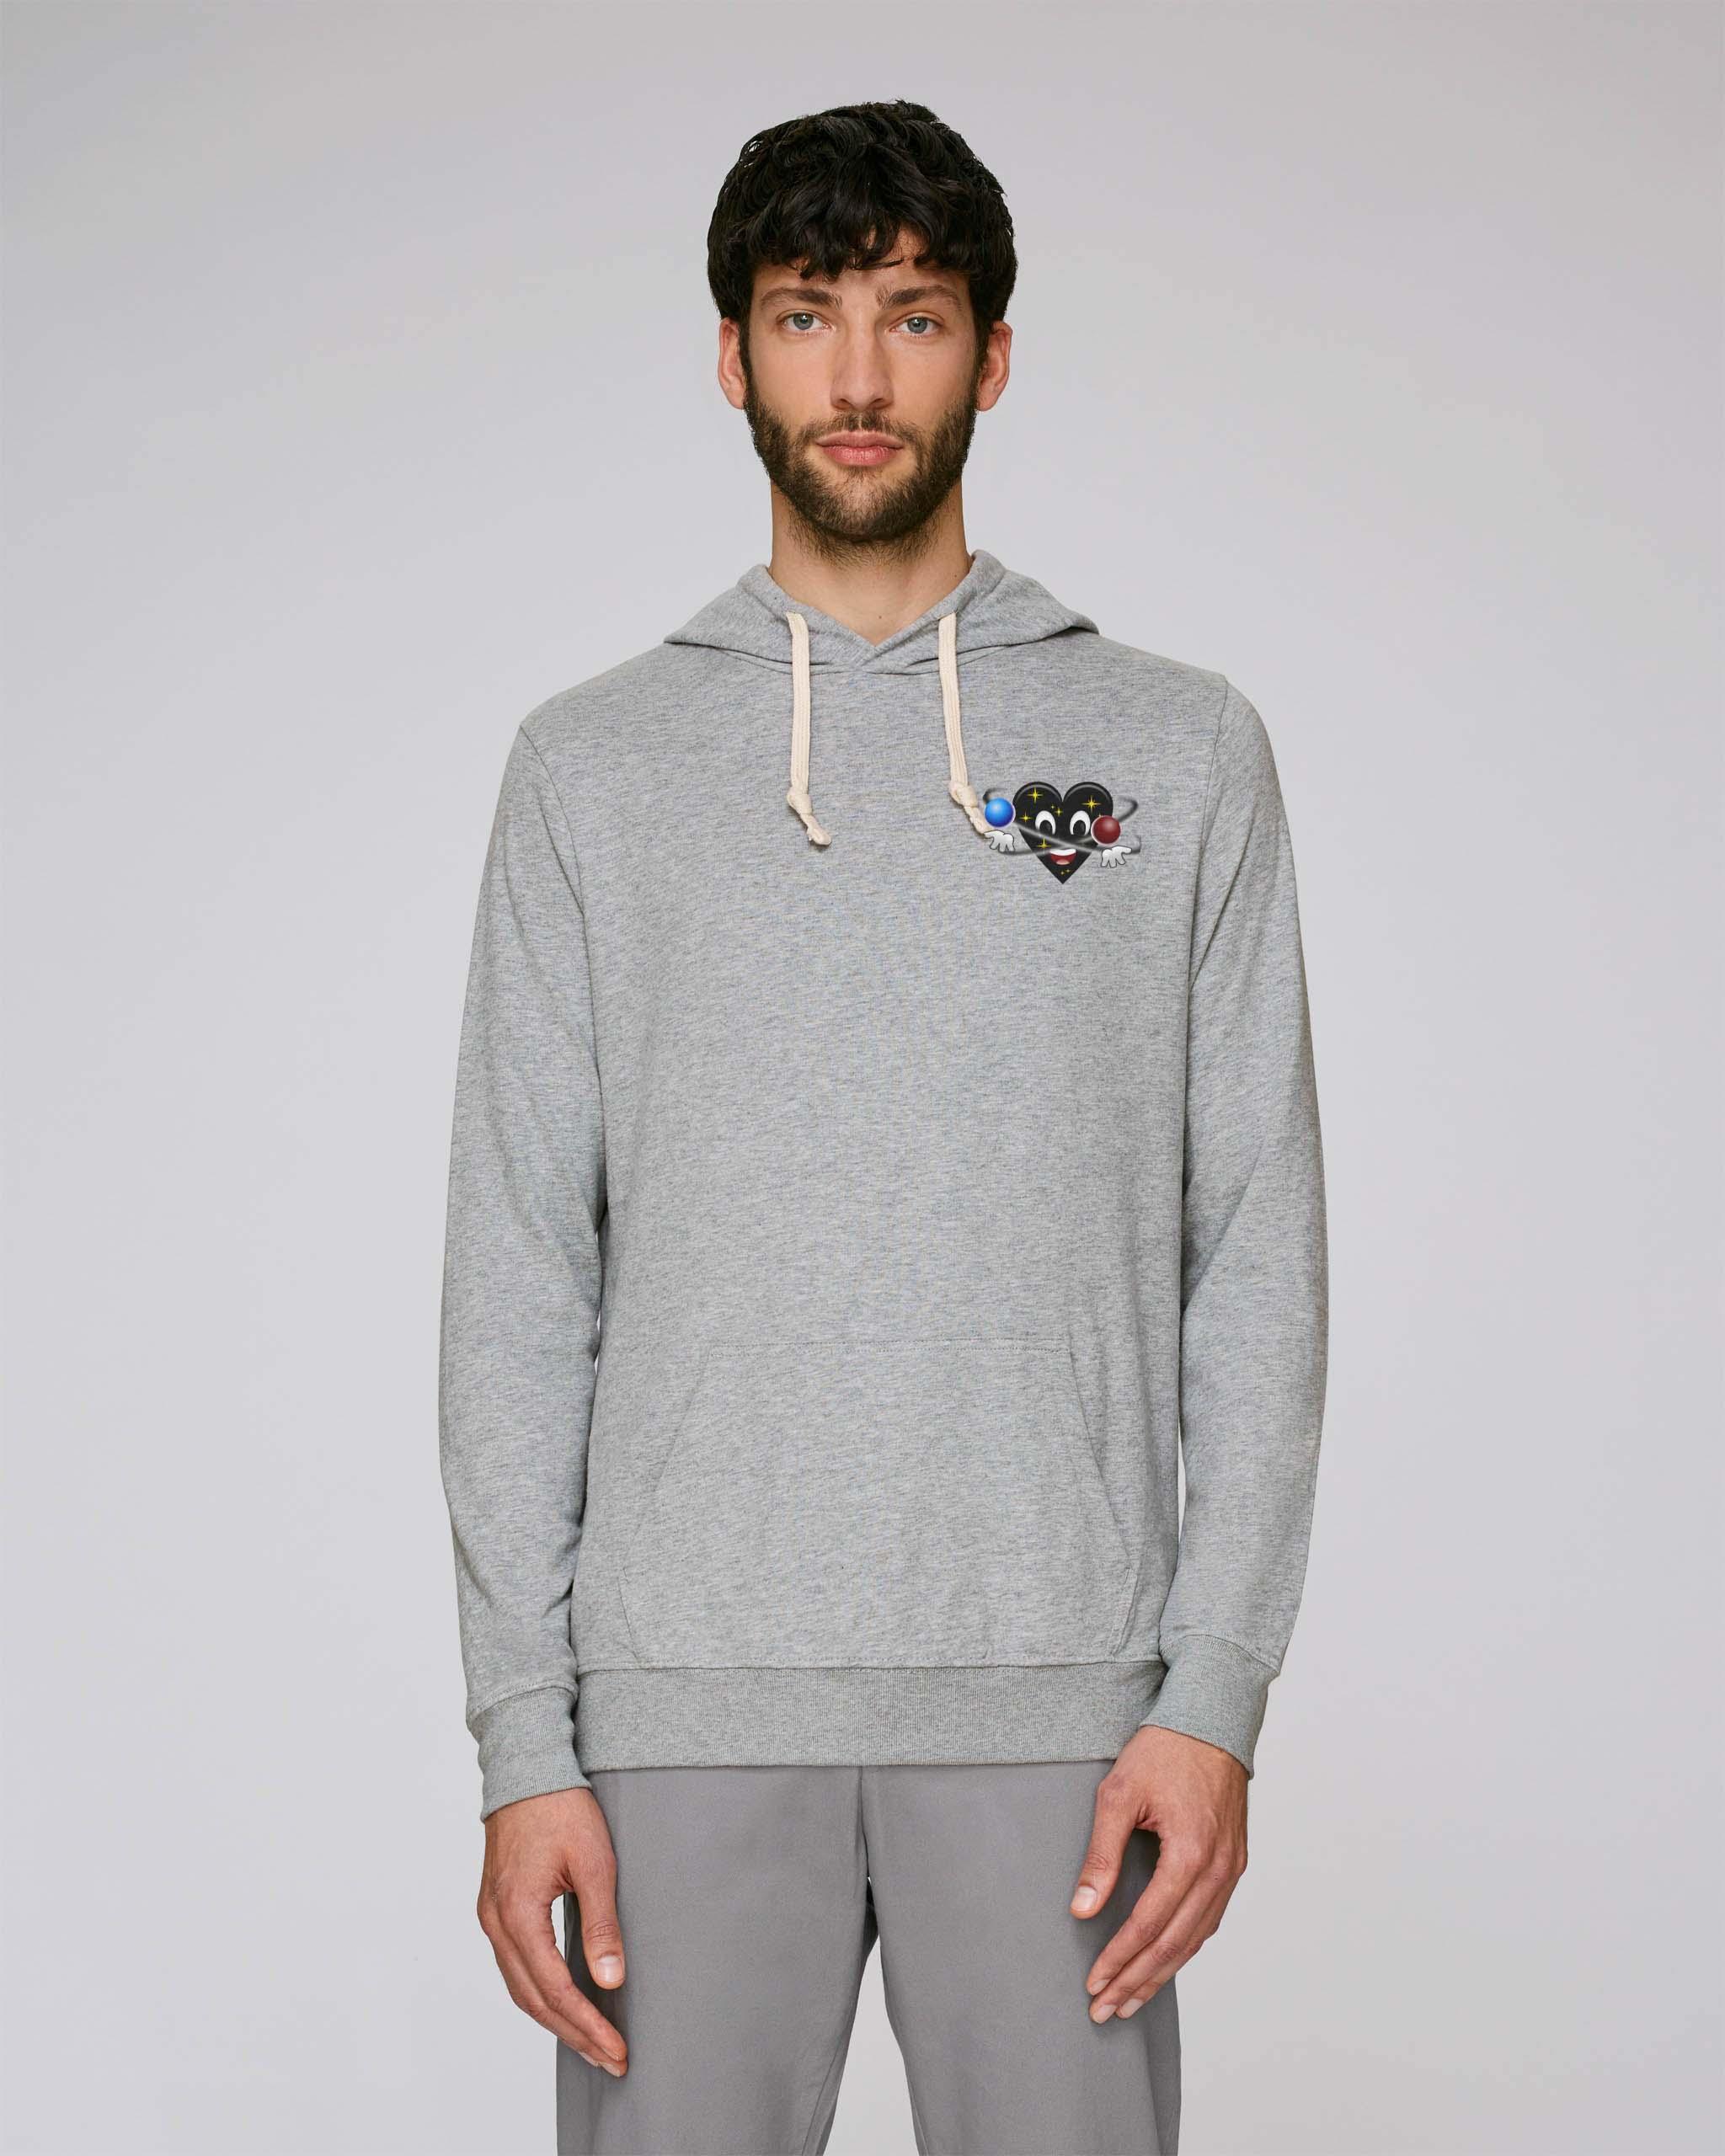 T-Shirt Bio gris Homme – Universe hoodie